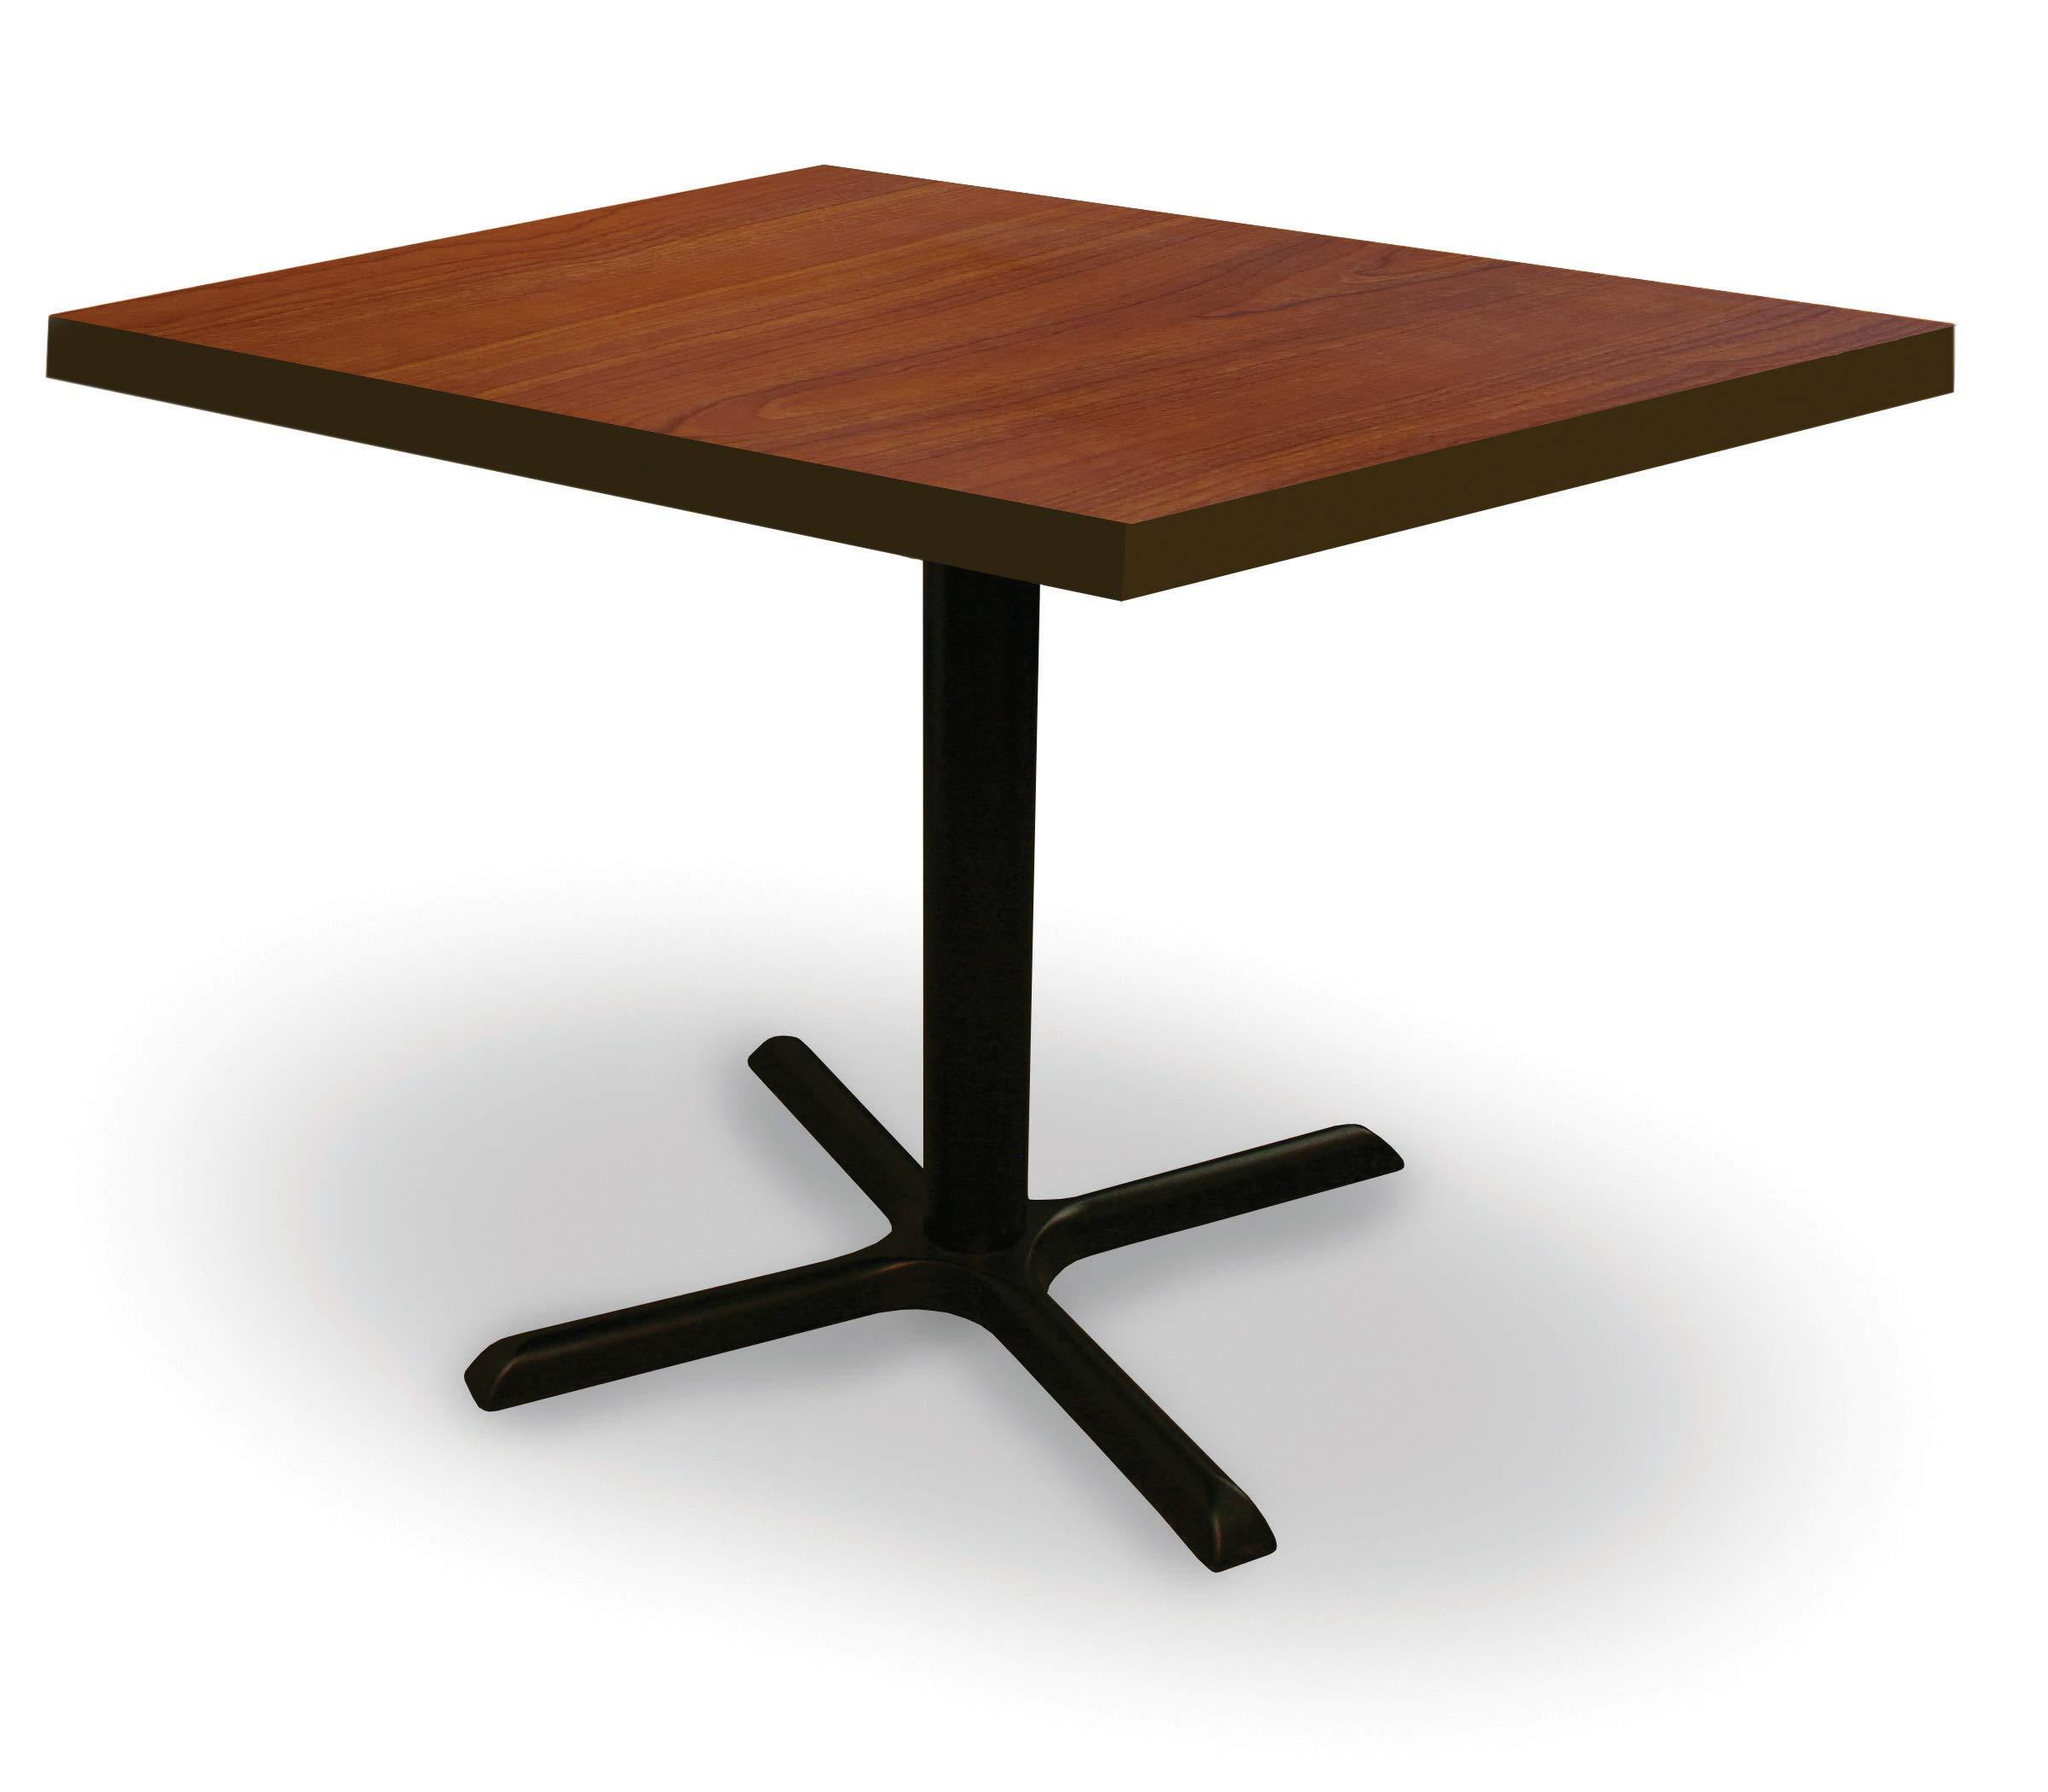 Square Conference, Break Room, Multipurpose Table 36''D x 36''W x 29''H - Collectors Cherry Laminate/Black Finish by MAMOF